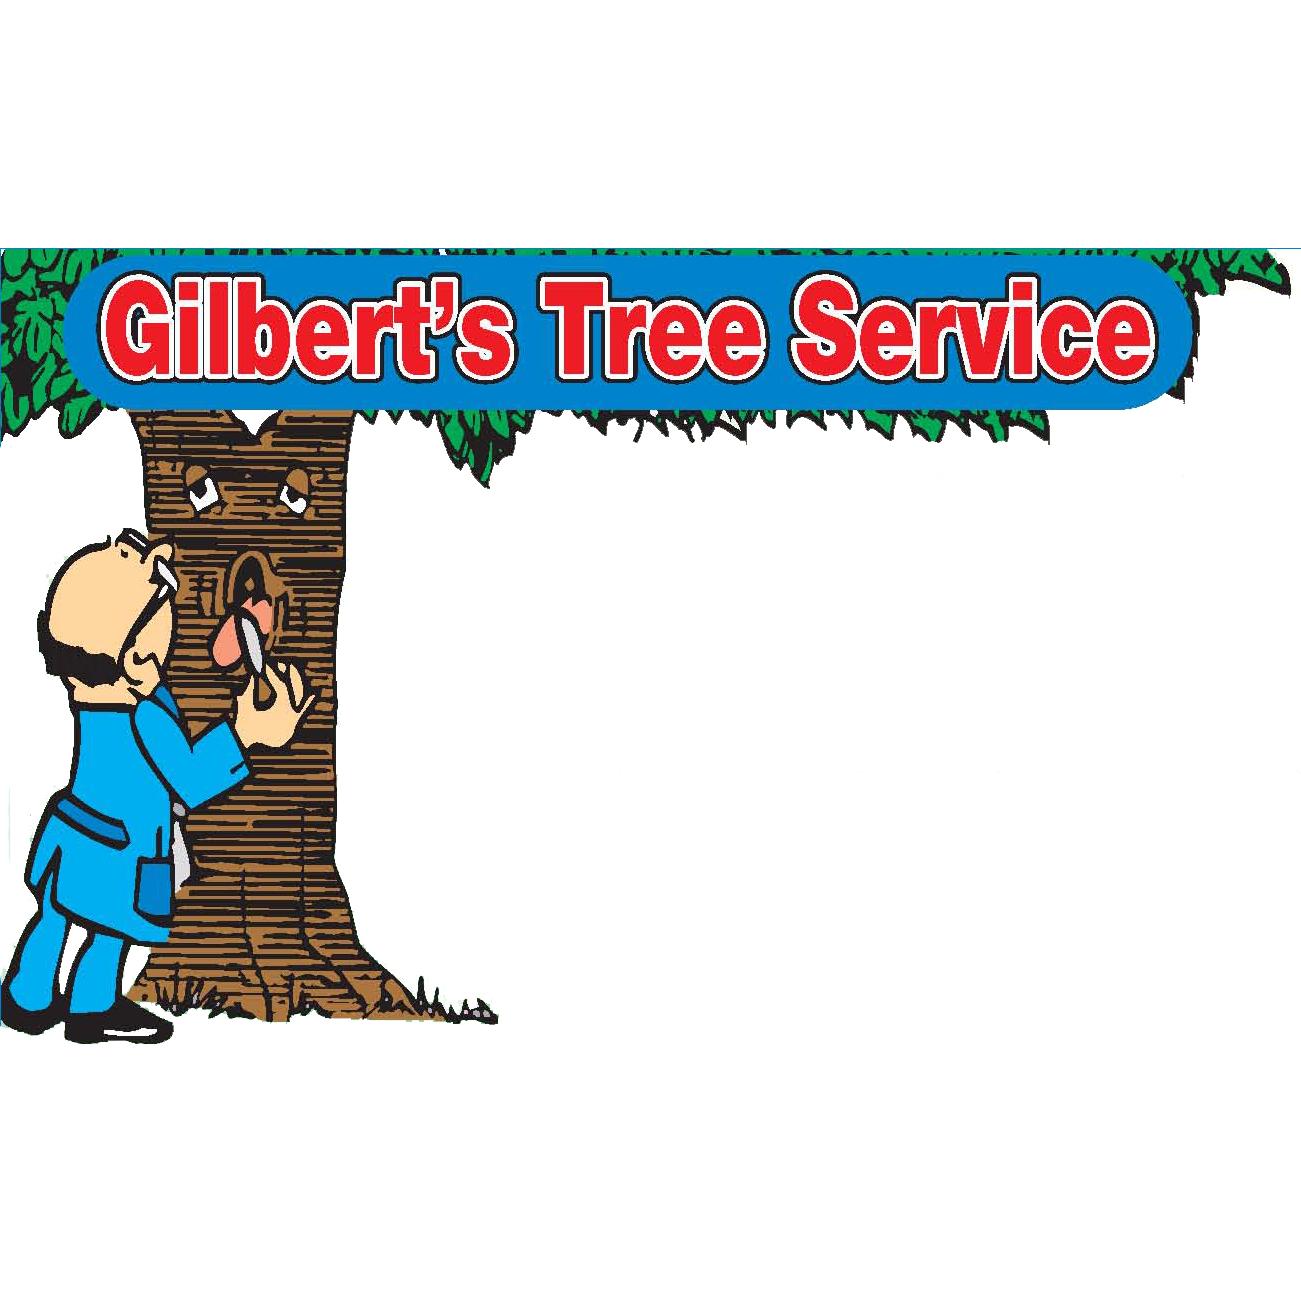 Gilbert's Tree Service - Mesa, AZ - Tree Services